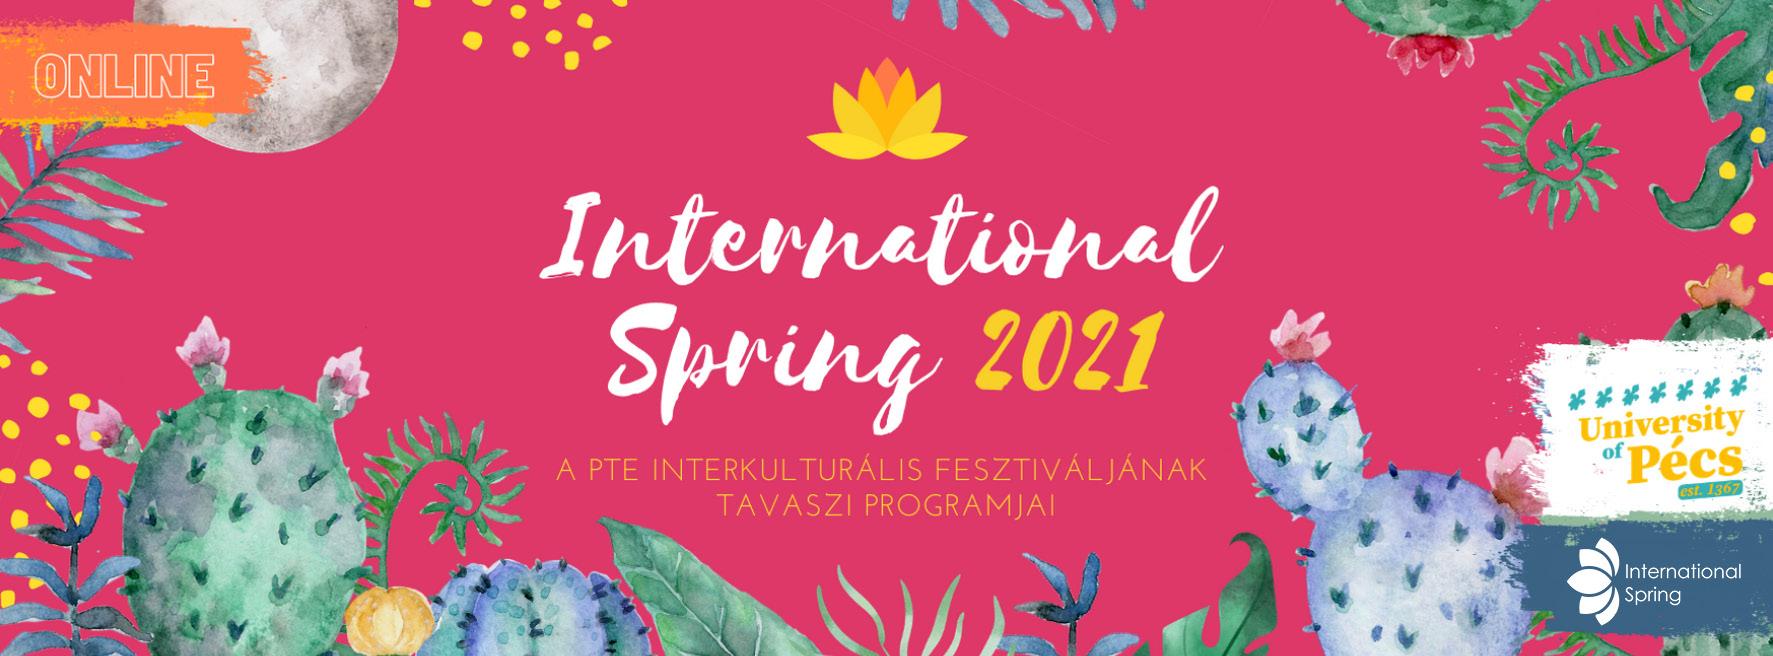 International Spring Pécs - Pécsi Nemzetközi Tavasz, PTE